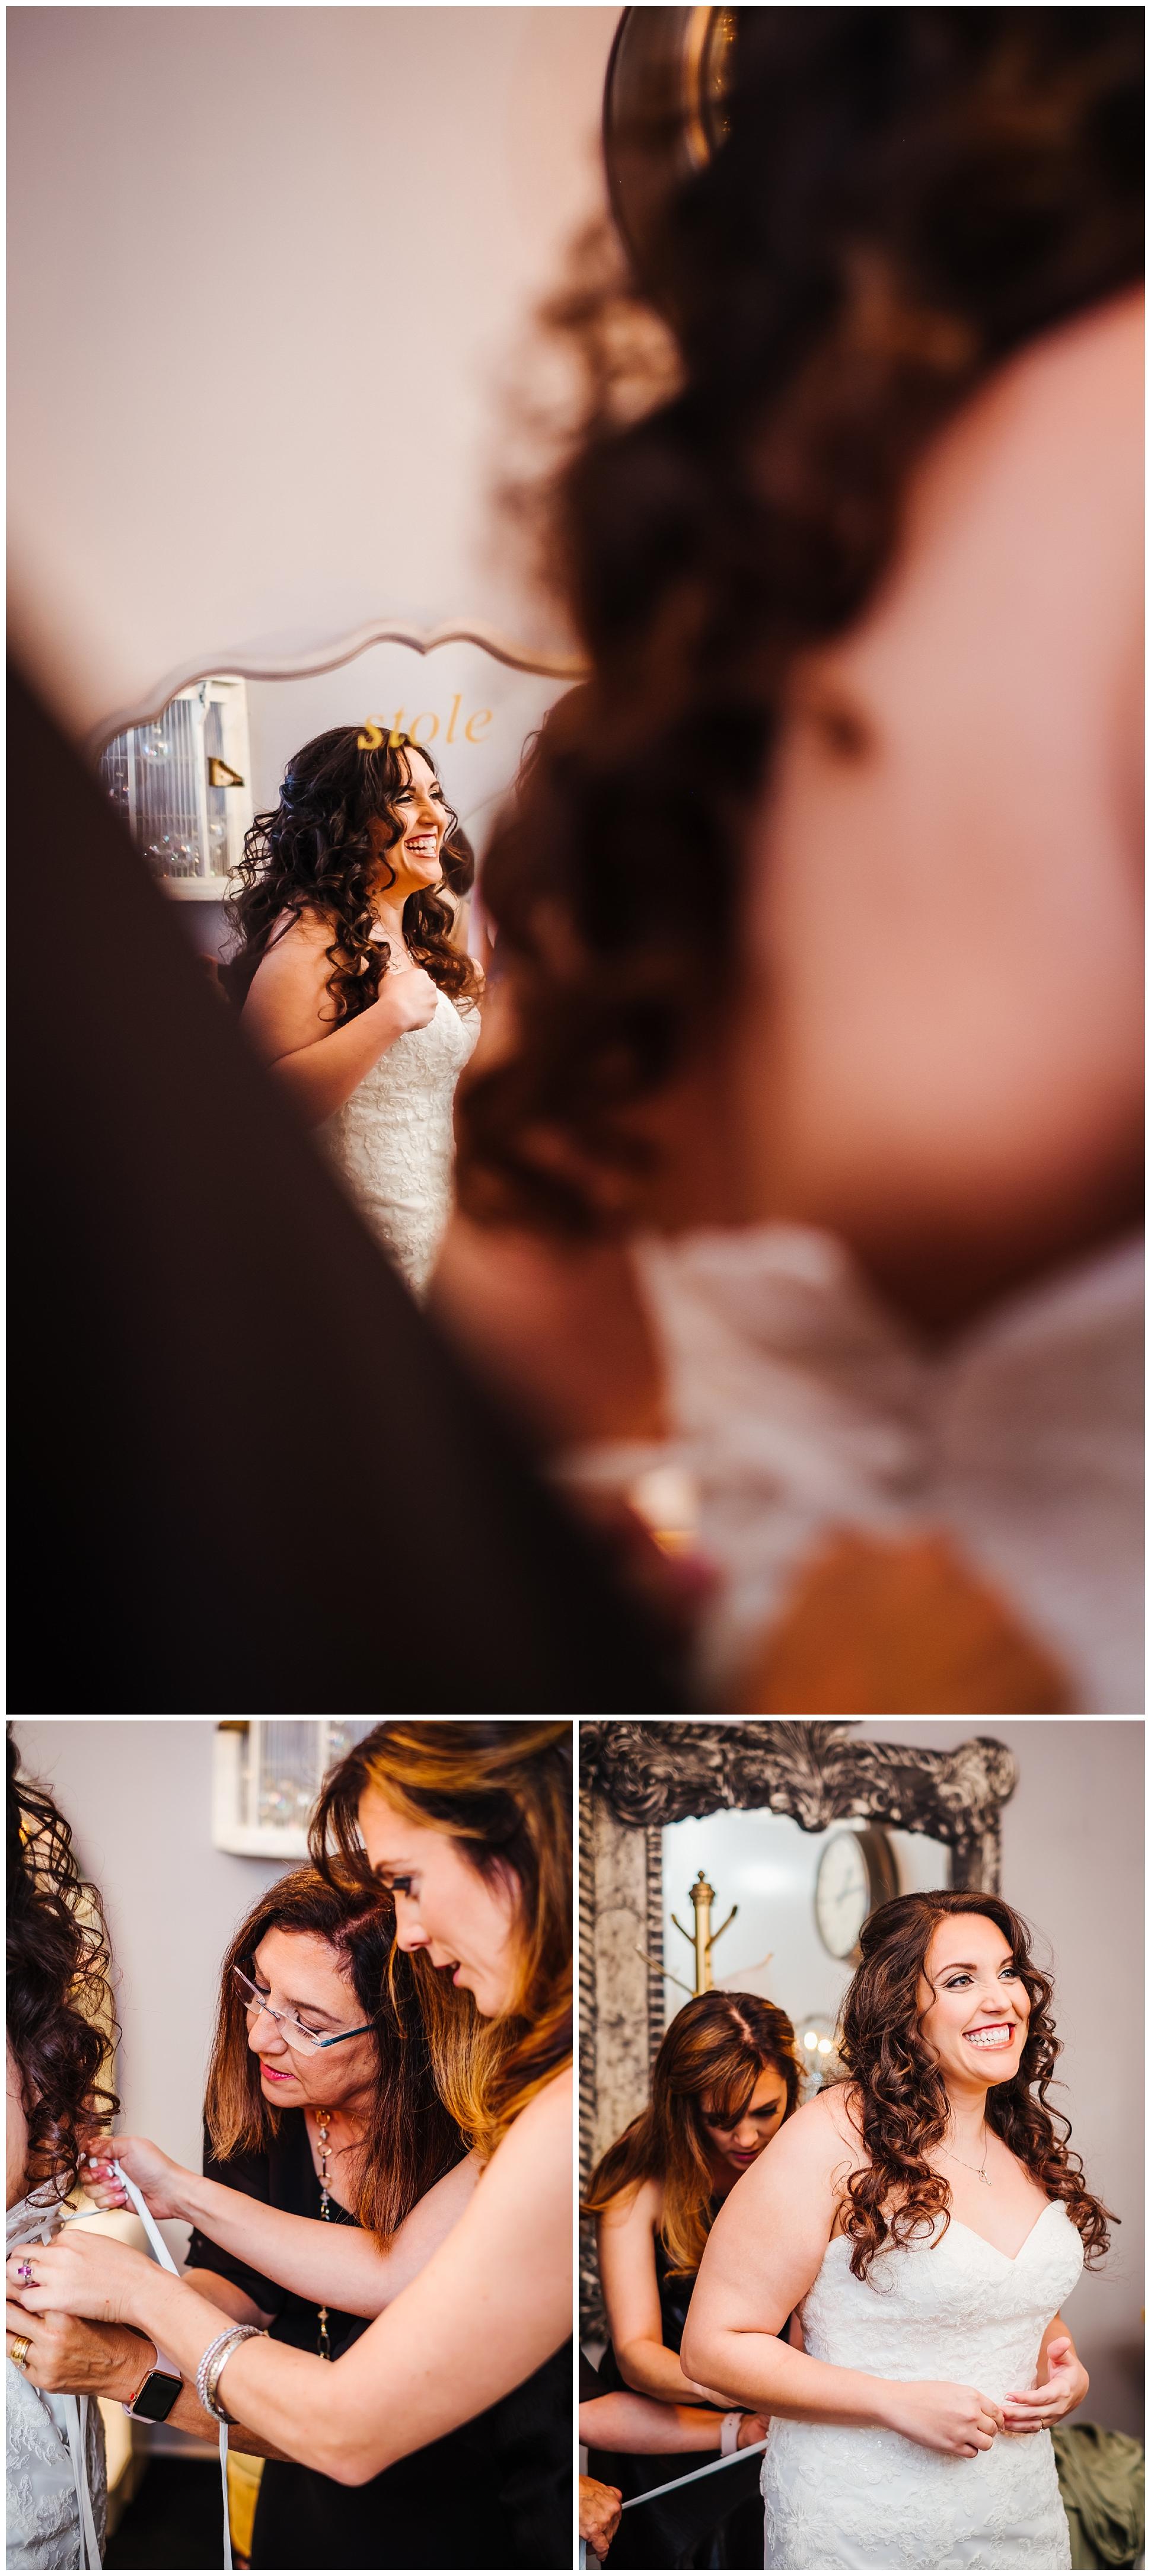 tampa-wedding-photographer-unique-indoor-venue_0009.jpg